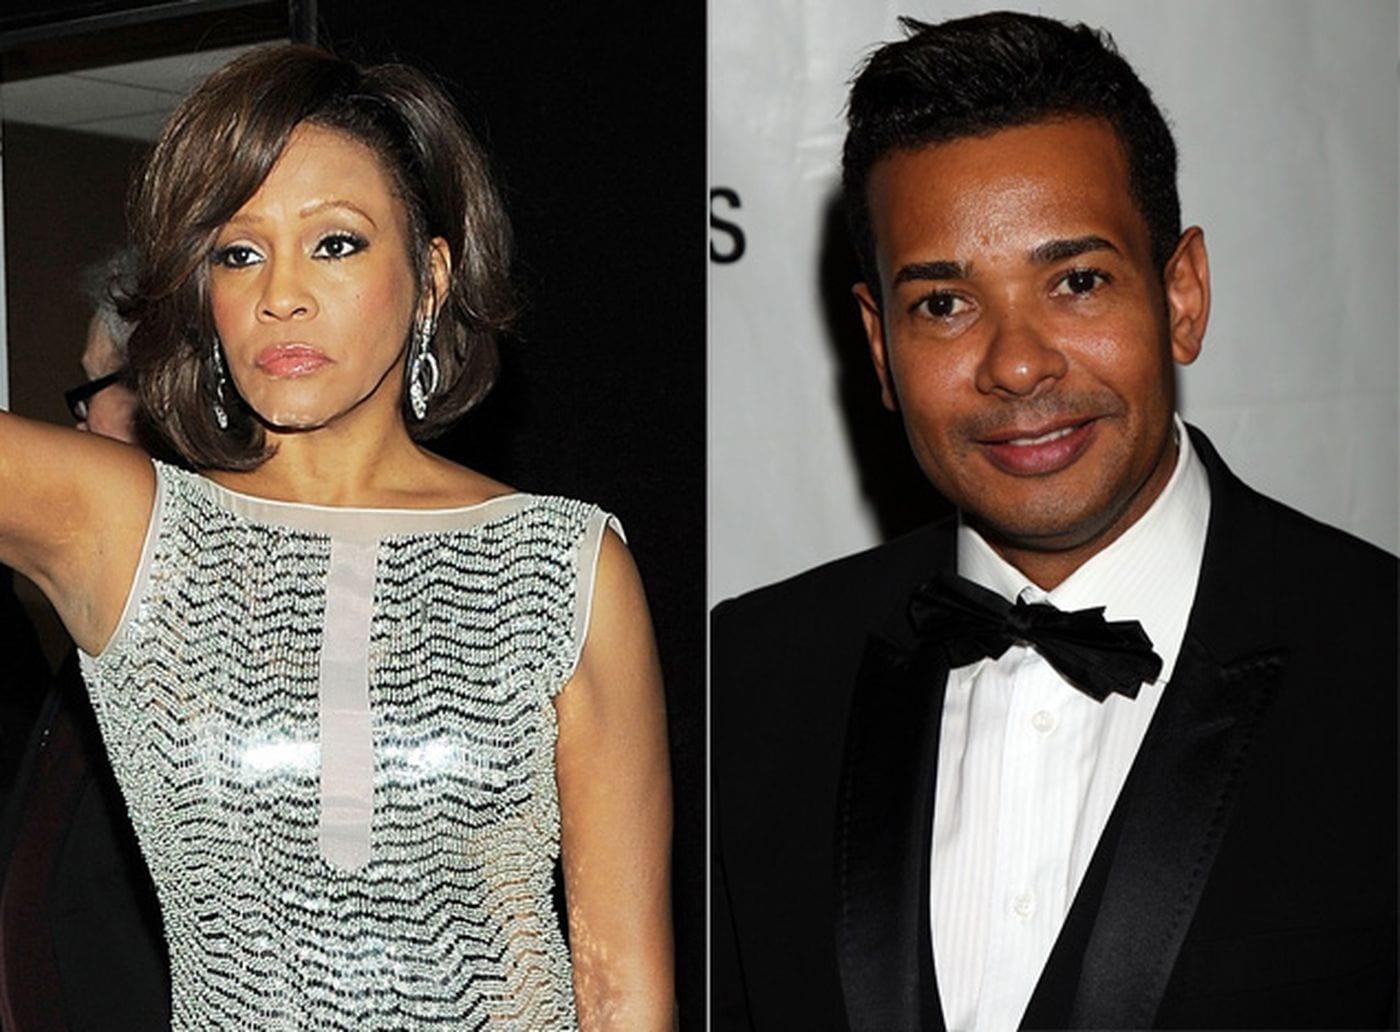 FOWDXVKZCGC5WJW2RTHYWGCFUY Raffles Van Exel Admits to Removing Evidence From Whitney Houston Death Scene